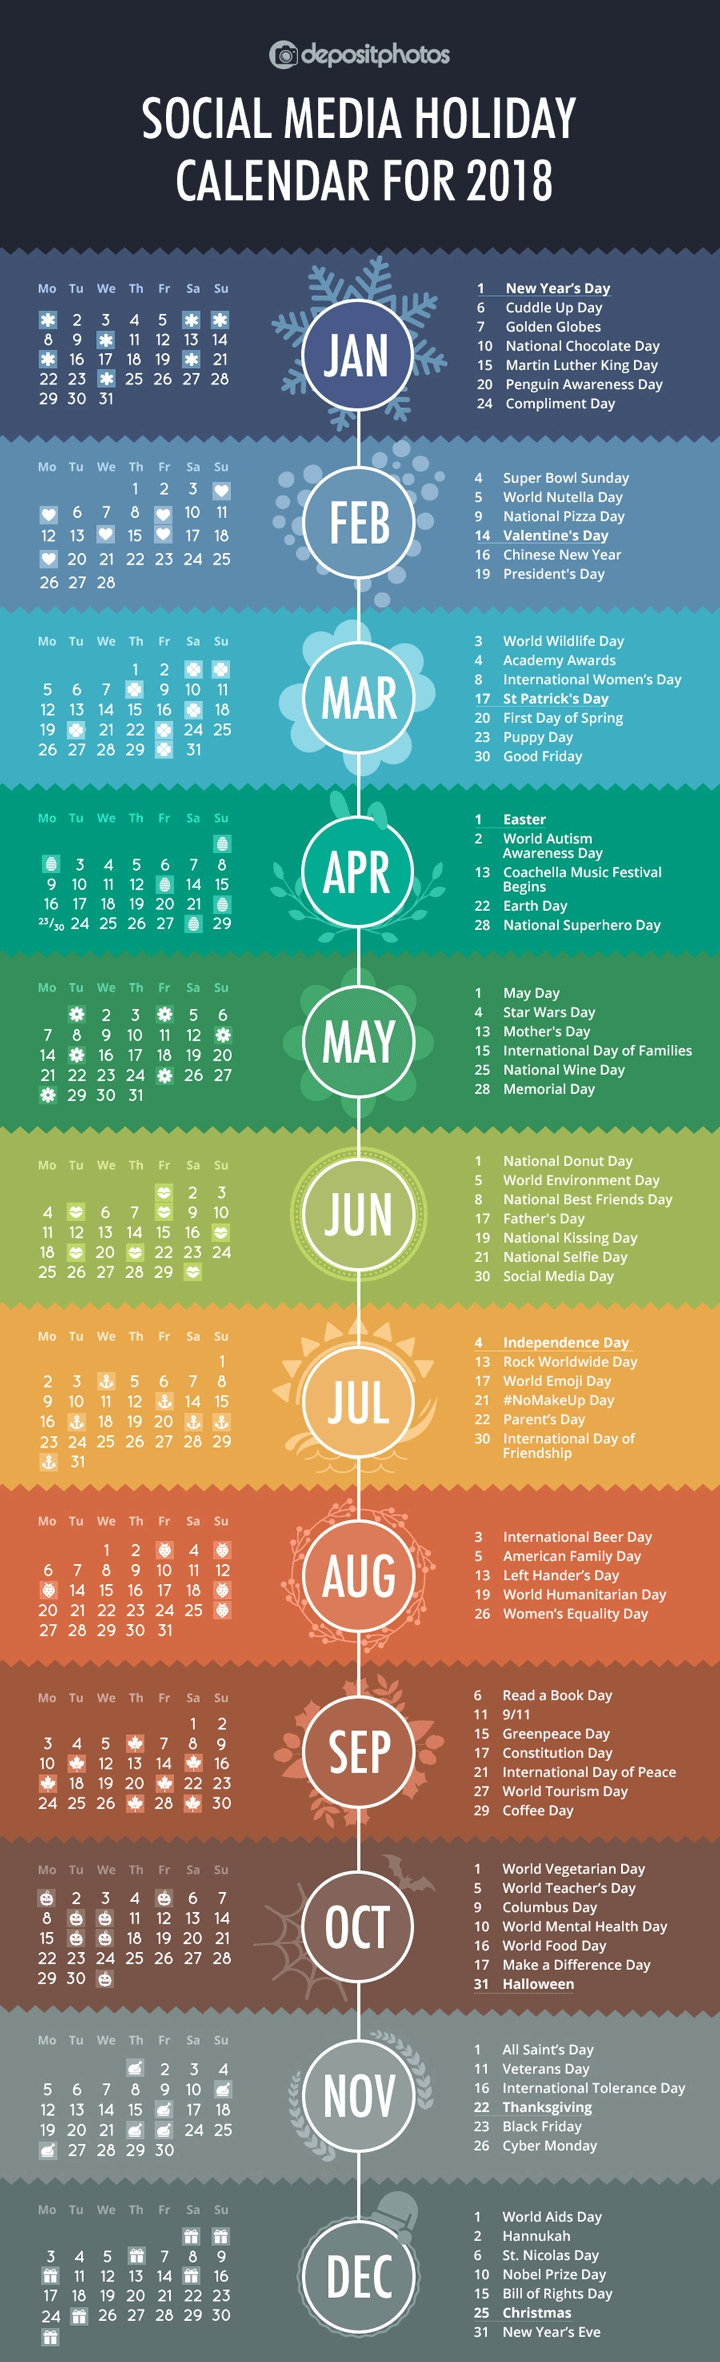 84 Social Media Holidays You Need In 2019: Indispensable! for Social Media Calendar For Apparel Brands